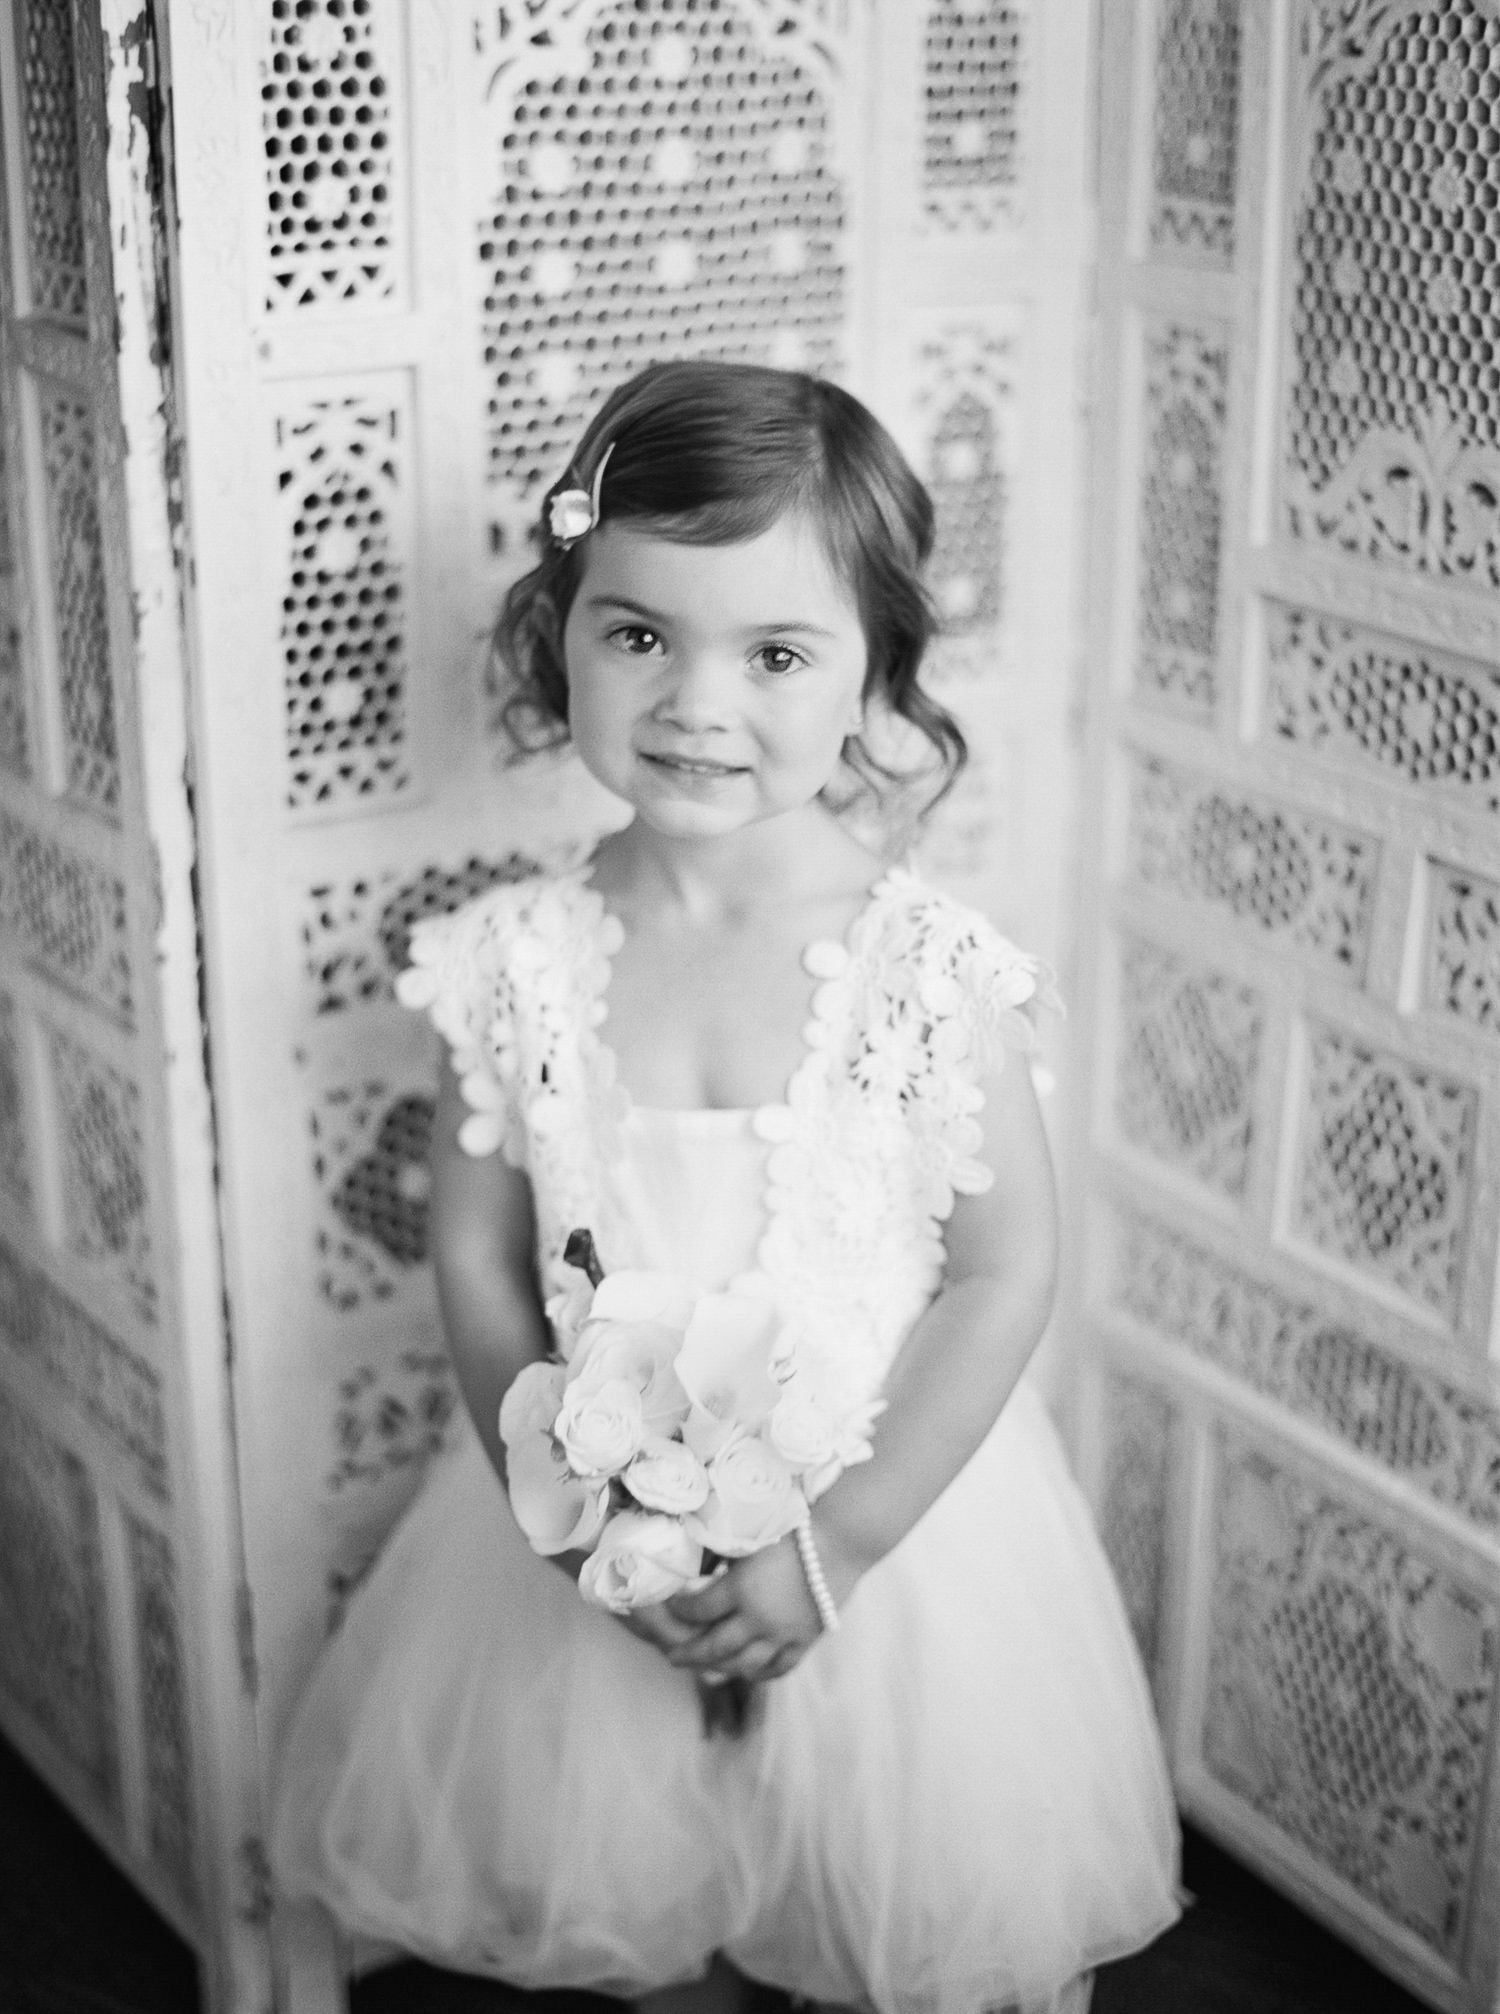 029OutliveCreative_Travel_Photographer_Videographer_Lewis&Clark_Oregon_Elegant_BlackTie_Destination_Wedding_1.jpg